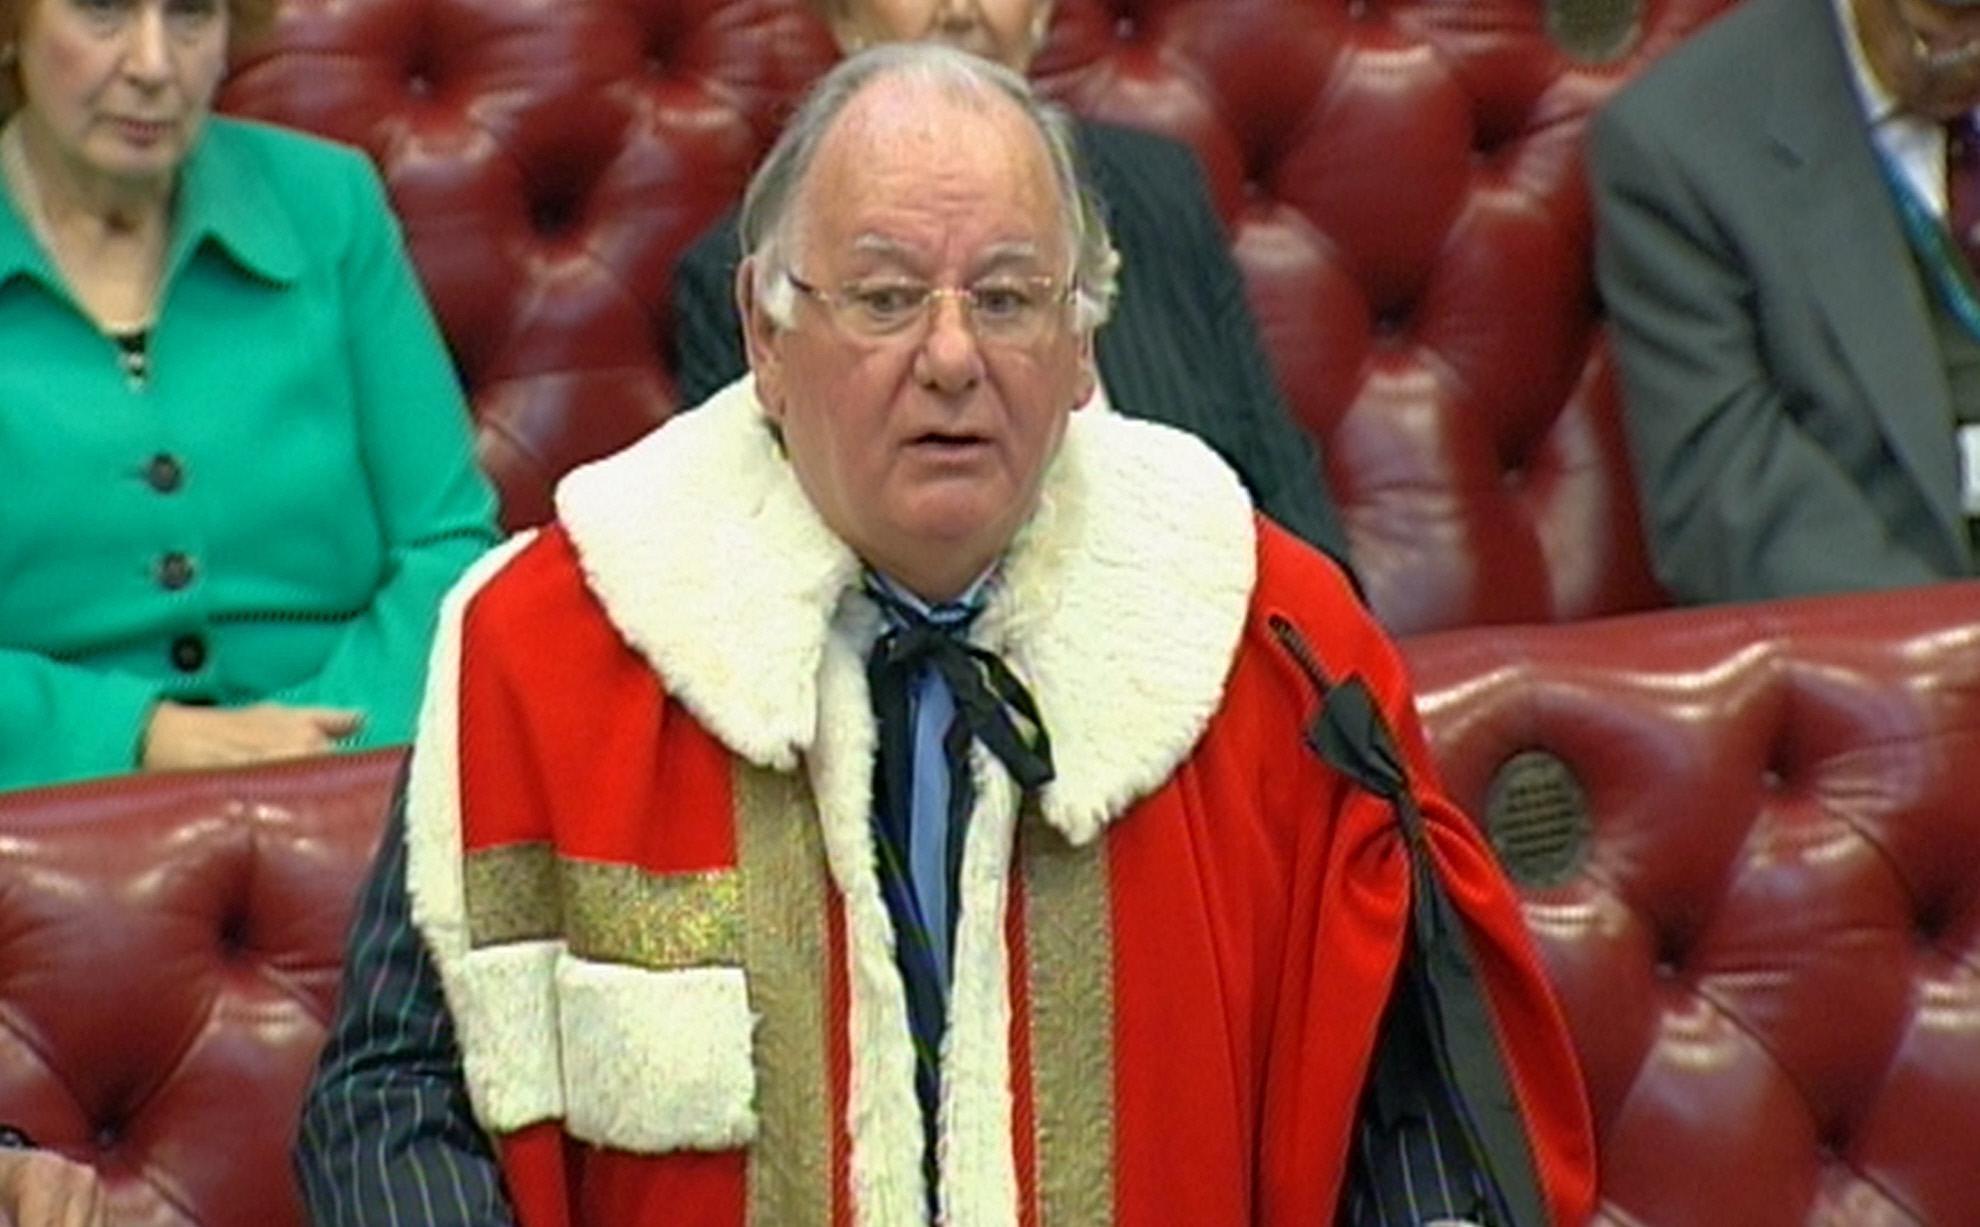 Former speaker Lord Martin dies aged 72